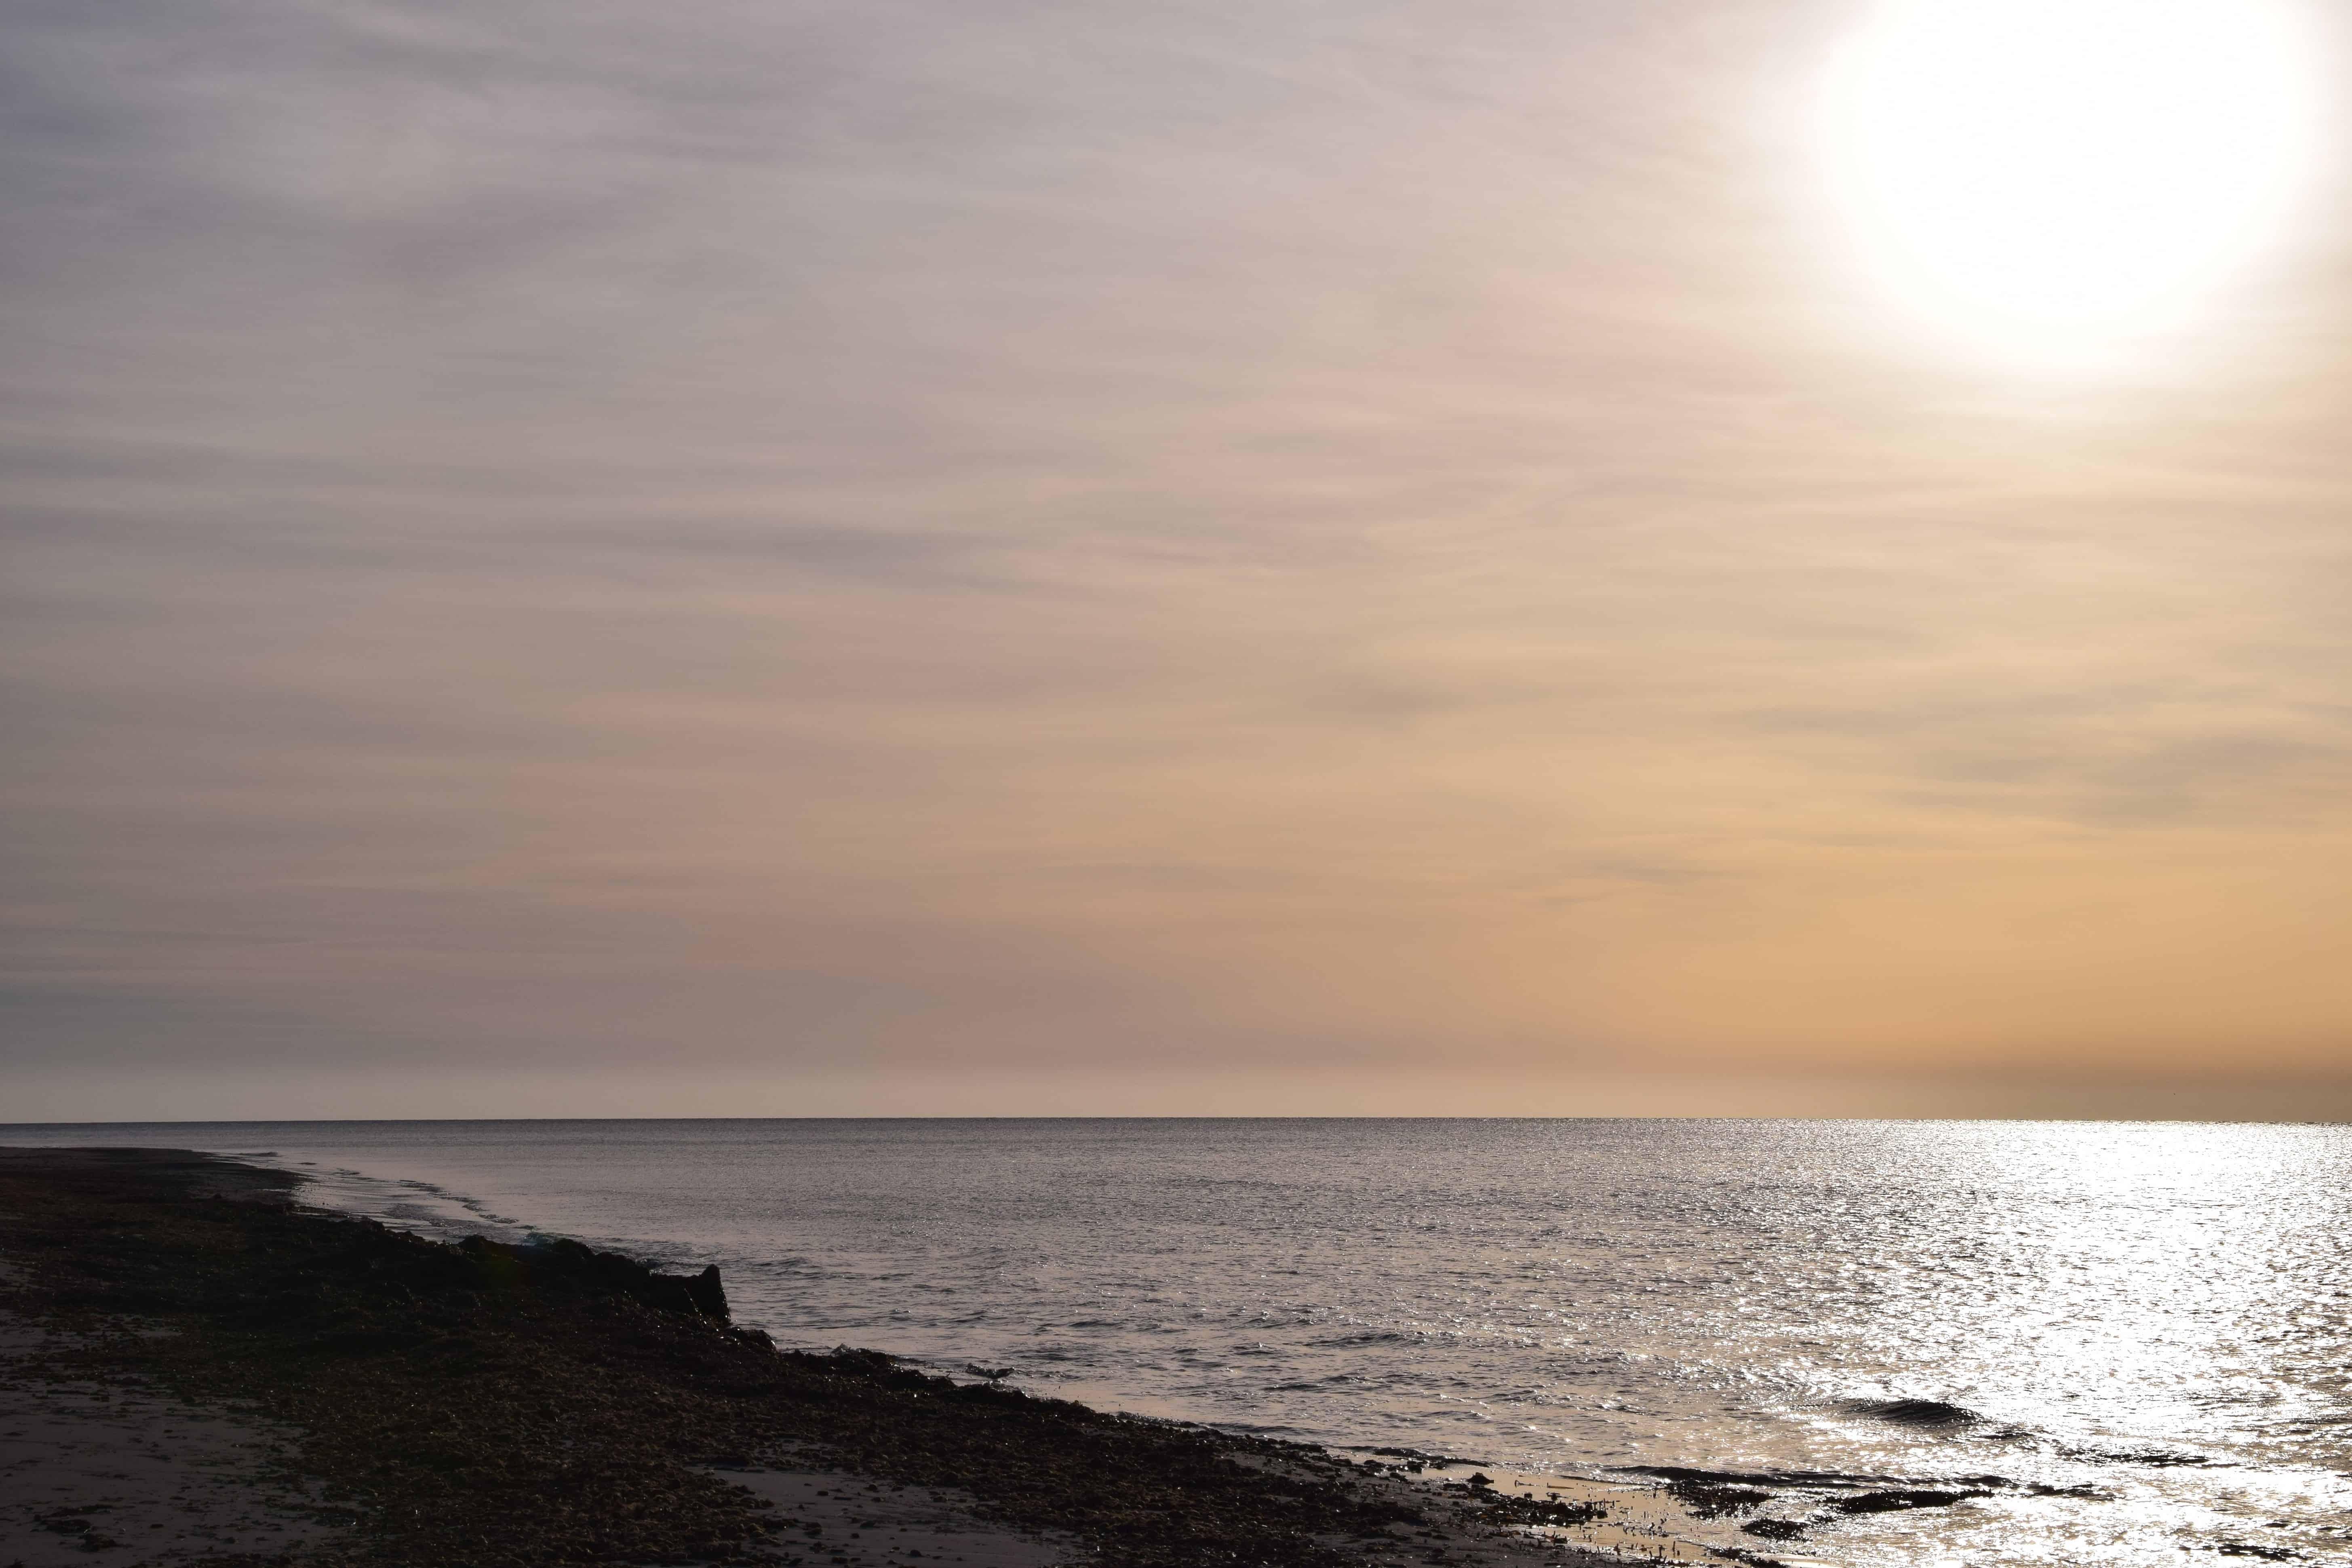 beaches free images, public domain images